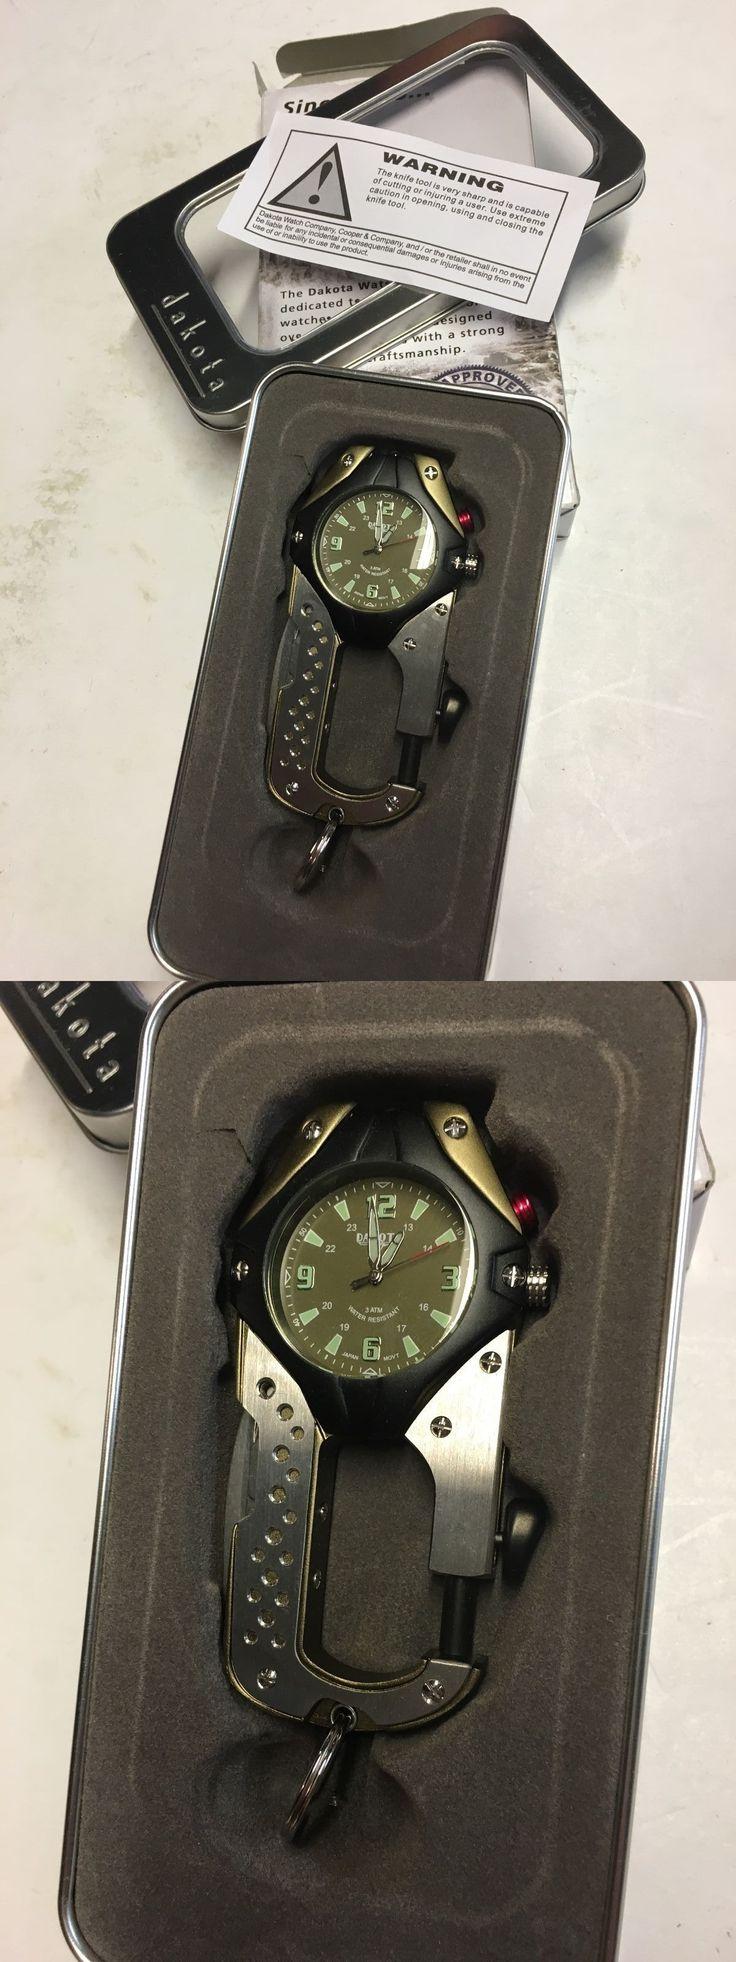 Other Pocket Watches 398: Dakota Digital Knife Clip Watch, 87630 -> BUY IT NOW ONLY: $54.27 on eBay!